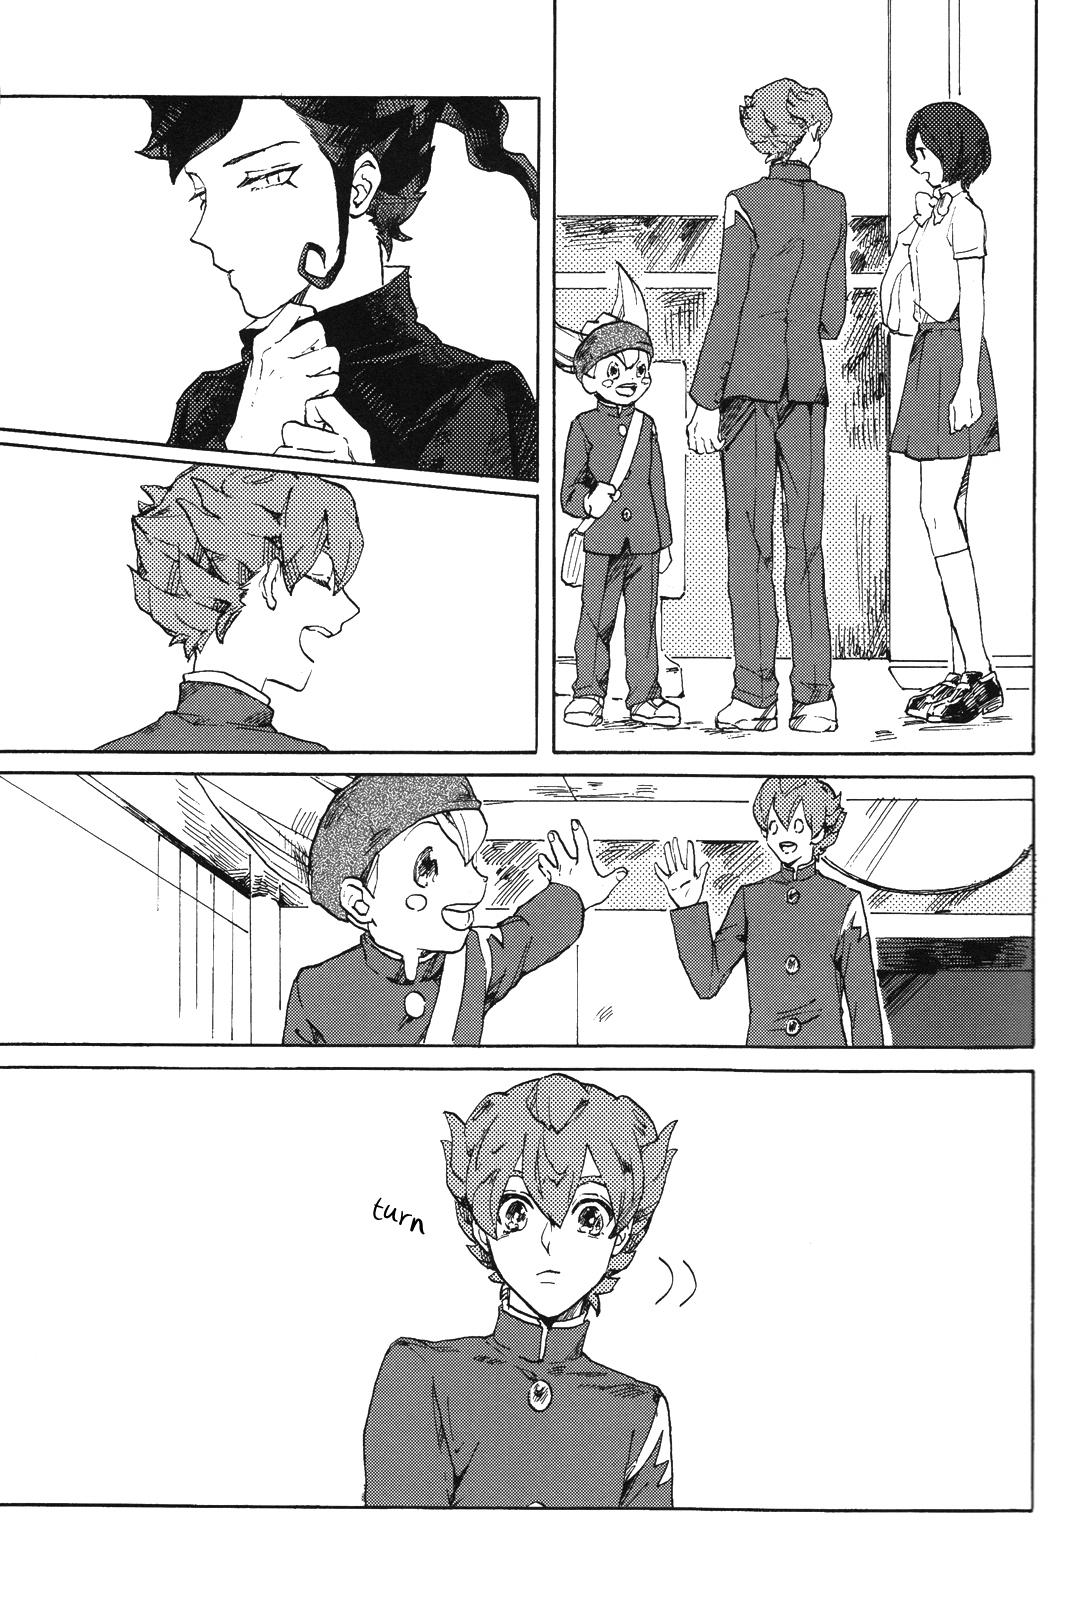 Anata no Kawaii Hito ni Naritai 2